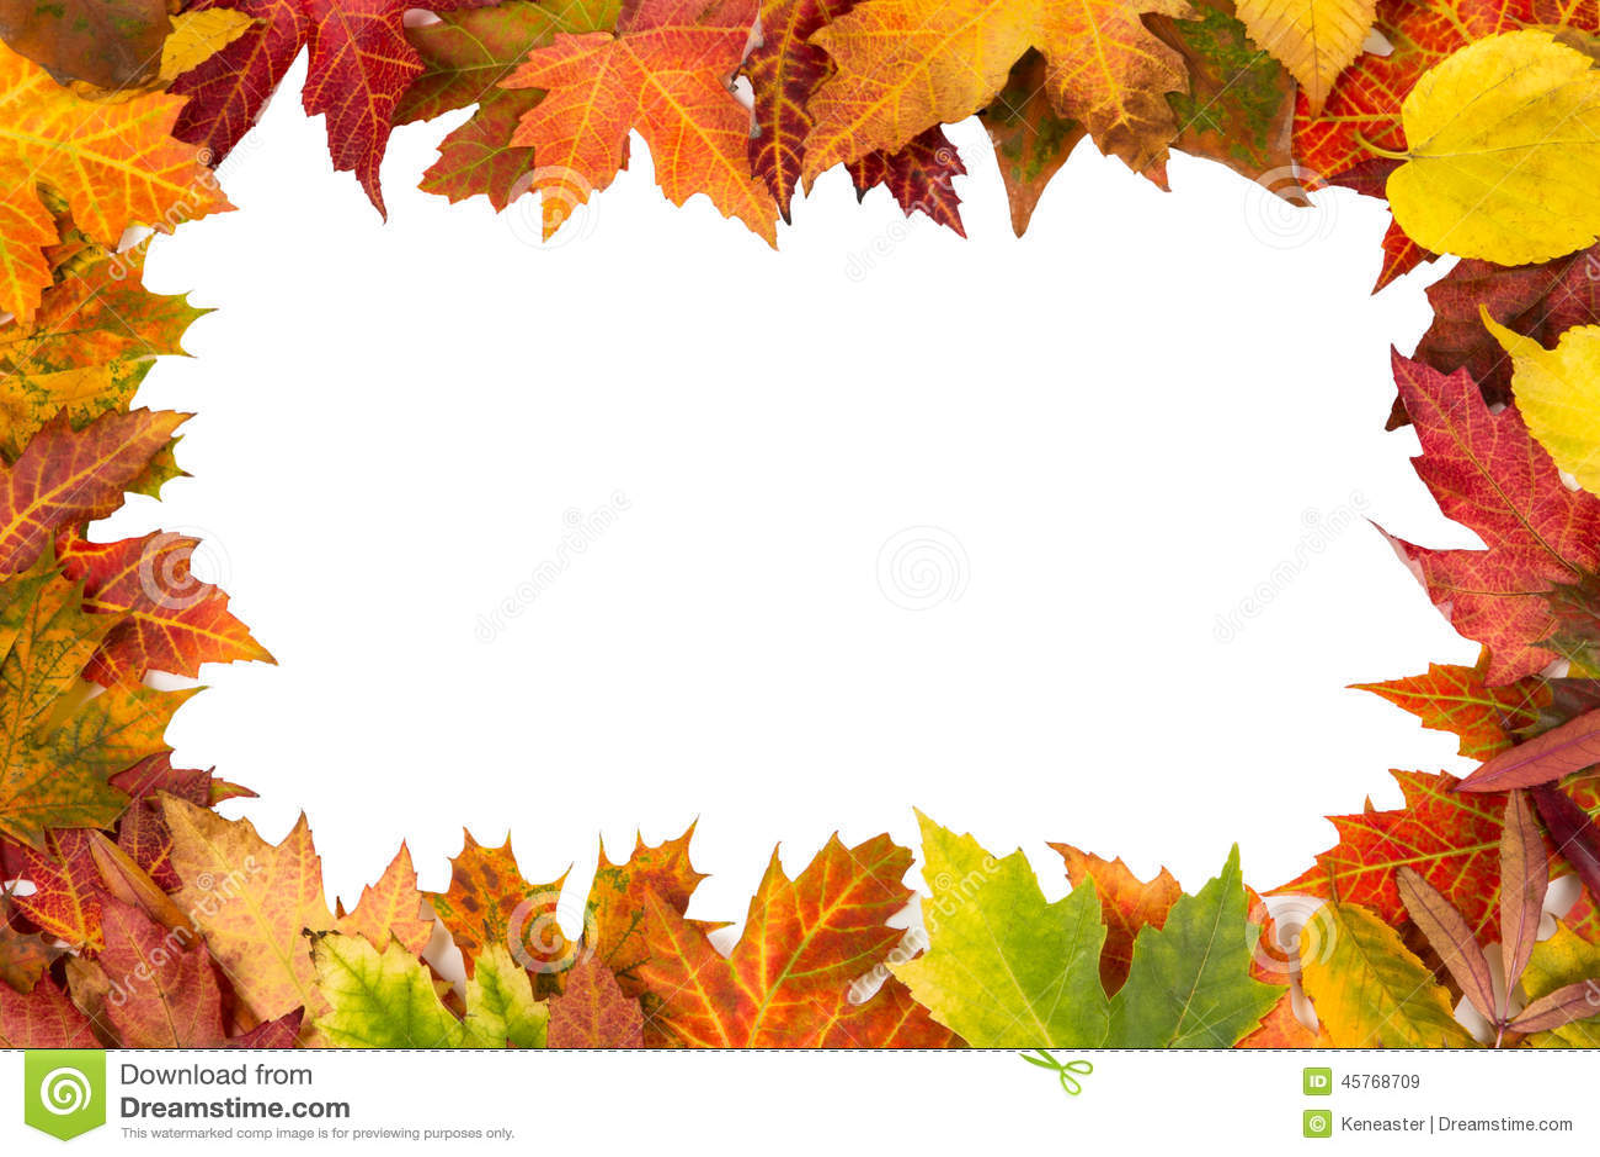 Autumn Weding Invitations 05 - Autumn Weding Invitations